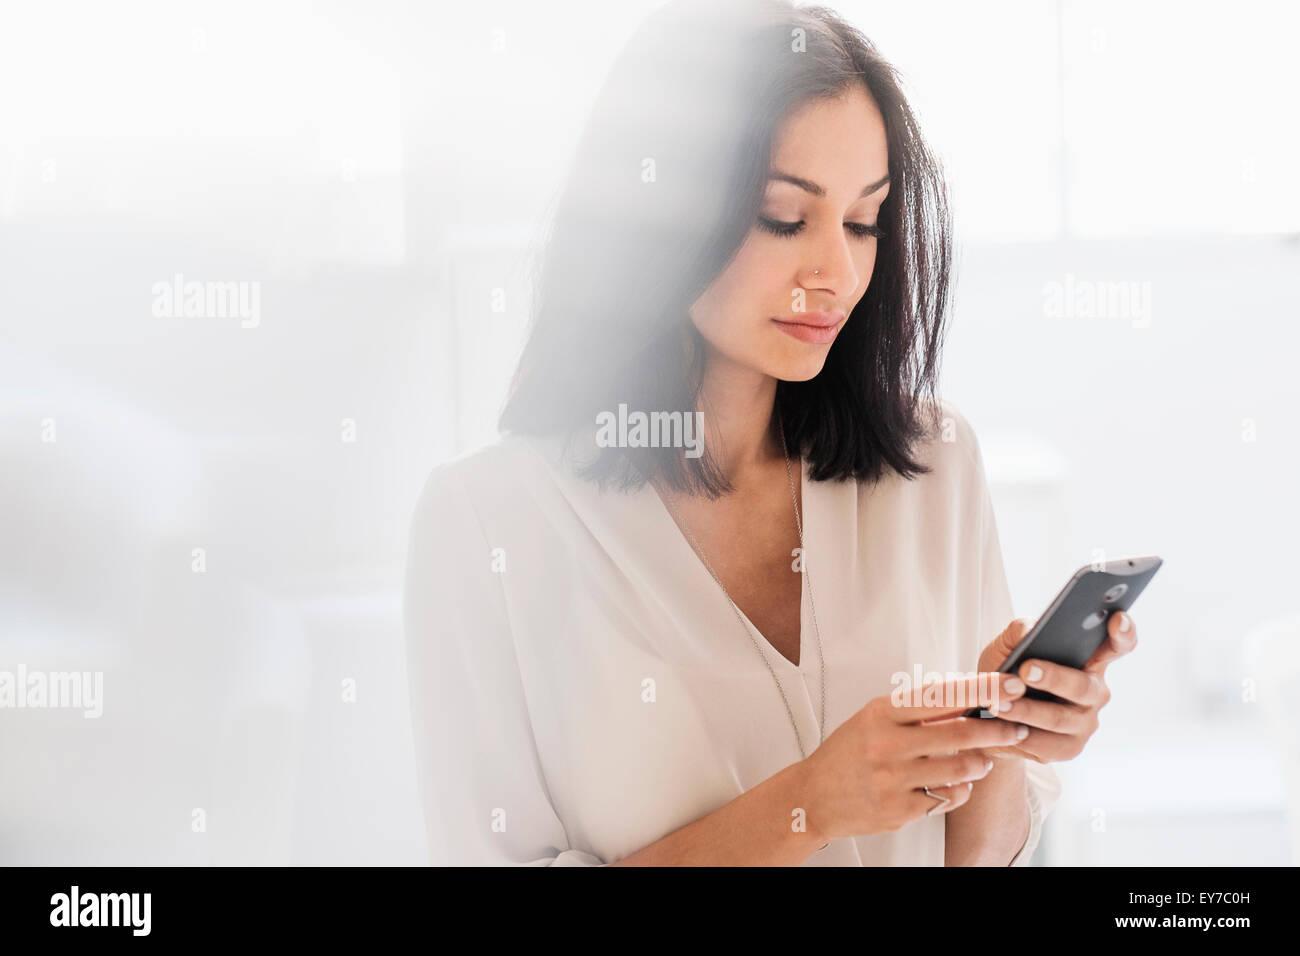 Mujer con teléfonos inteligentes. Imagen De Stock